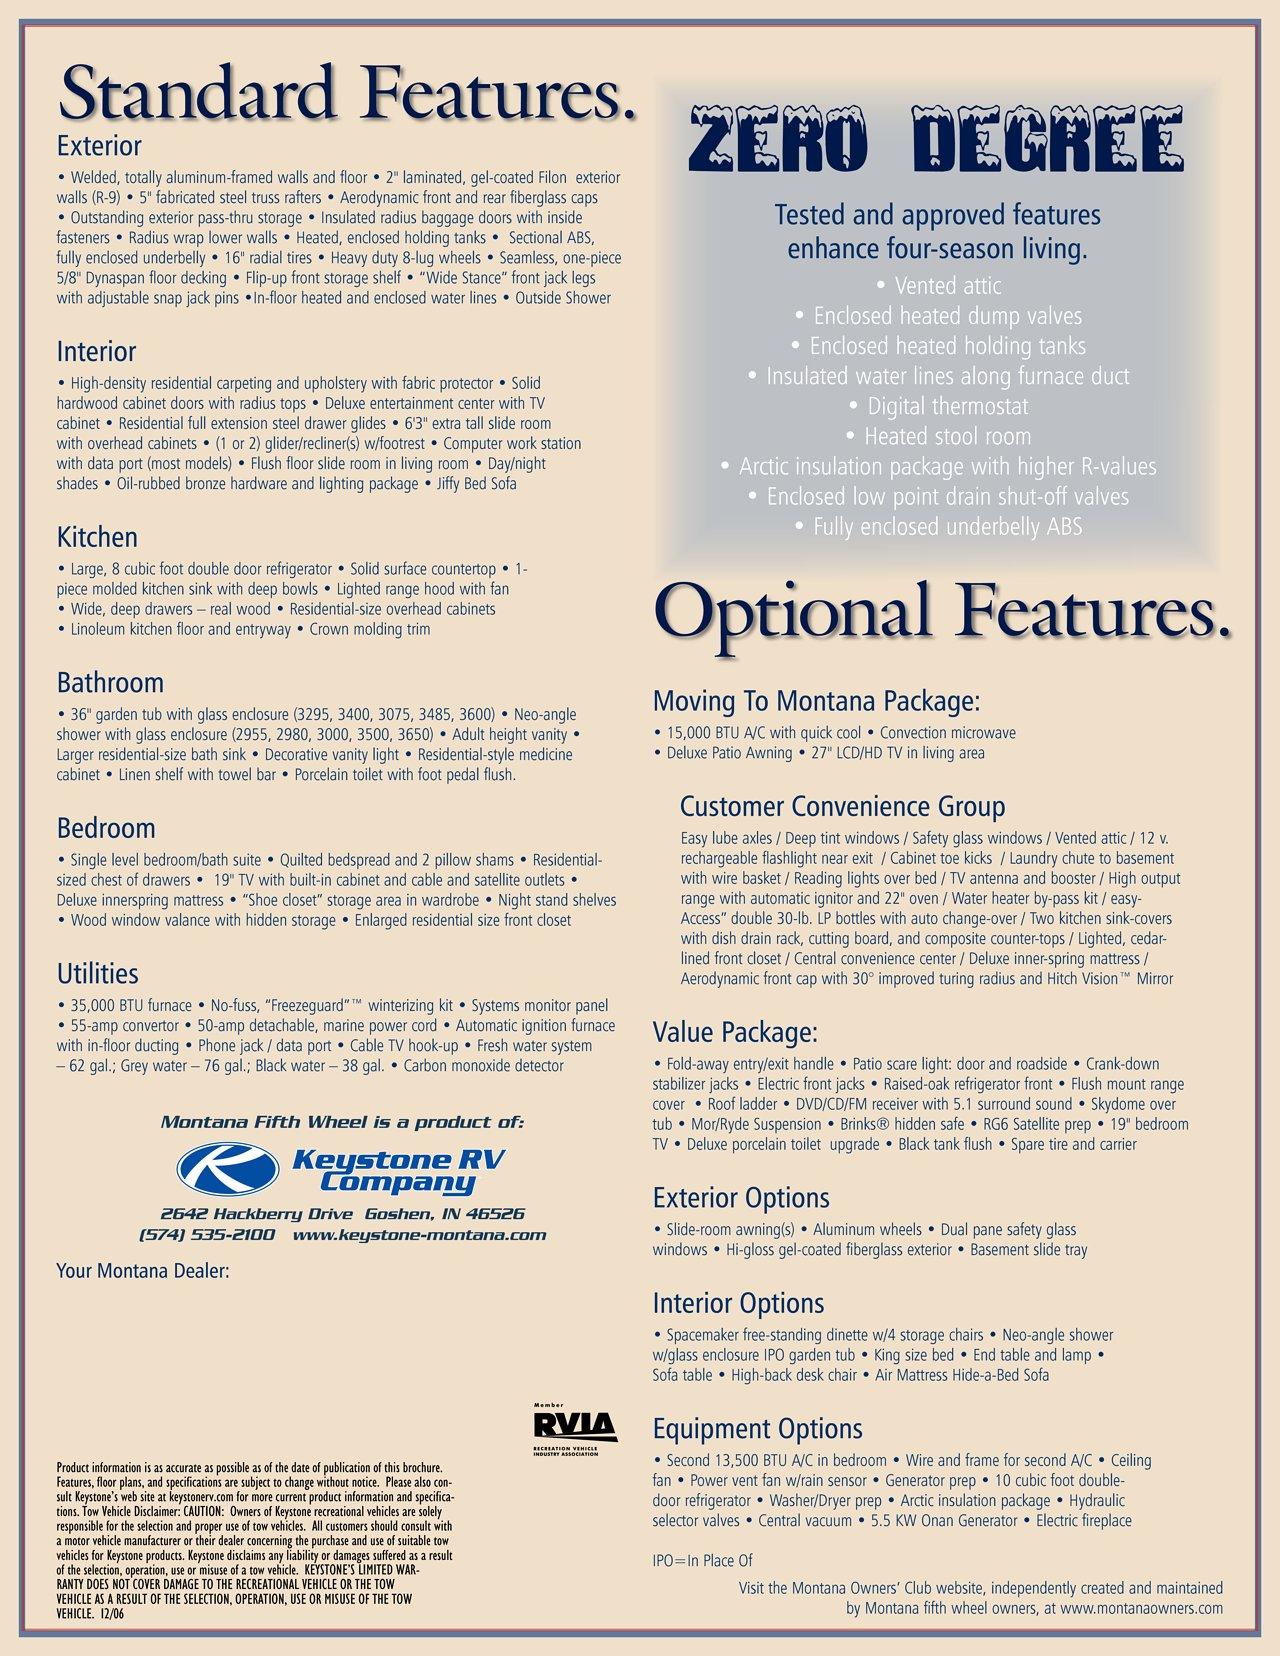 2007 Keystone RV Montana Brochure   RV brochures download